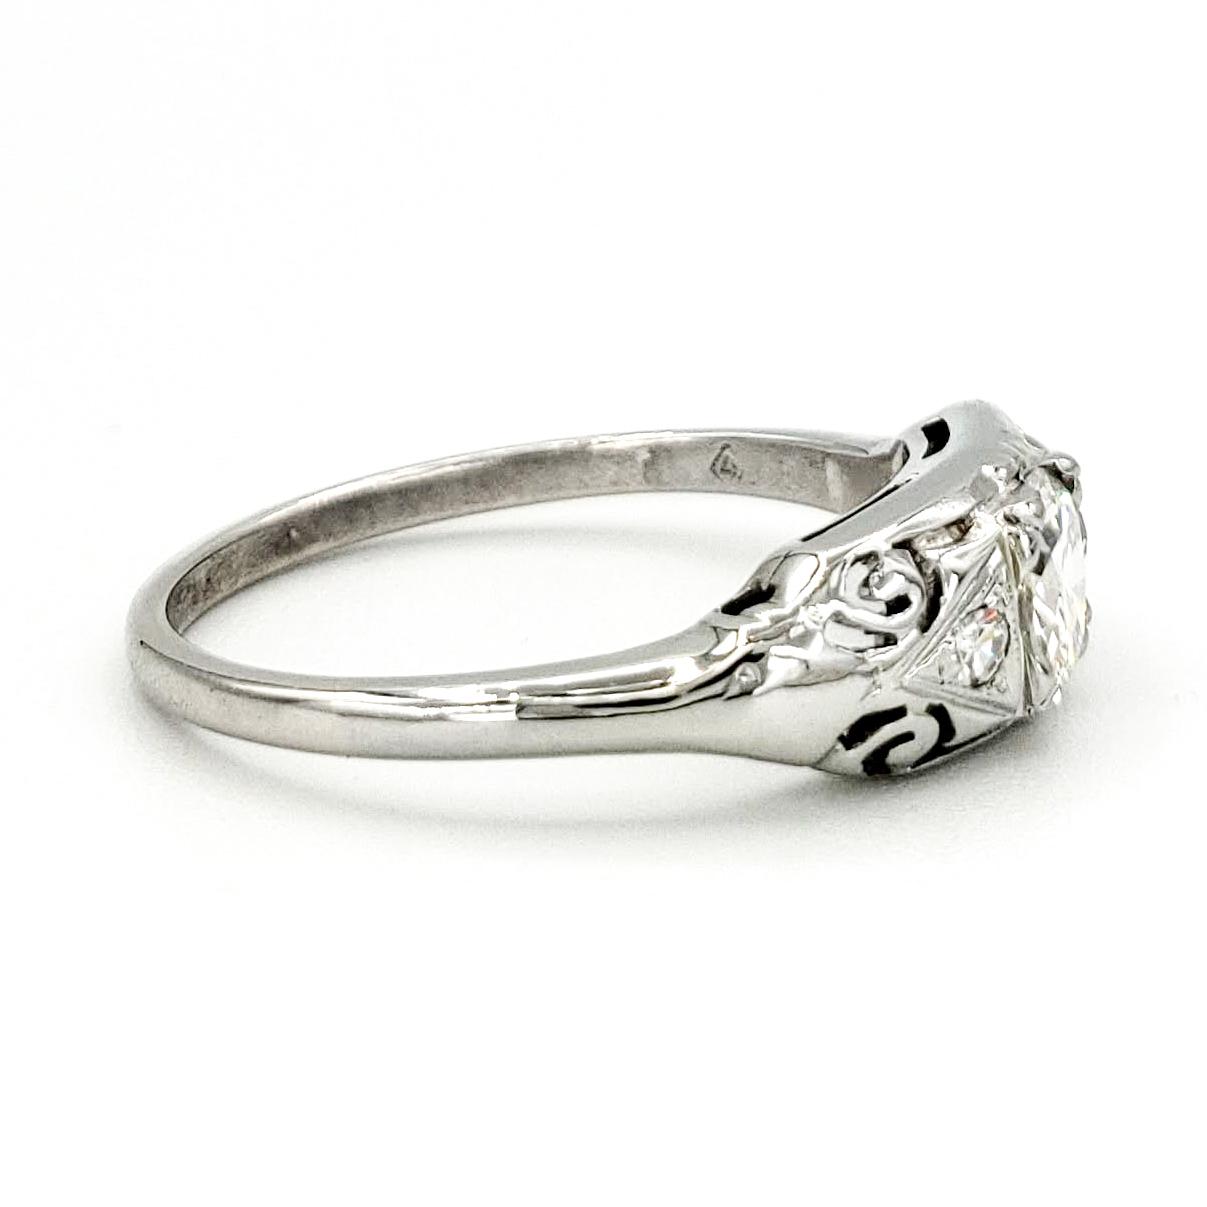 vintage-18-karat-gold-engagement-ring-with-0-35-carat-transitional-cut-diamond-egl-g-vs2